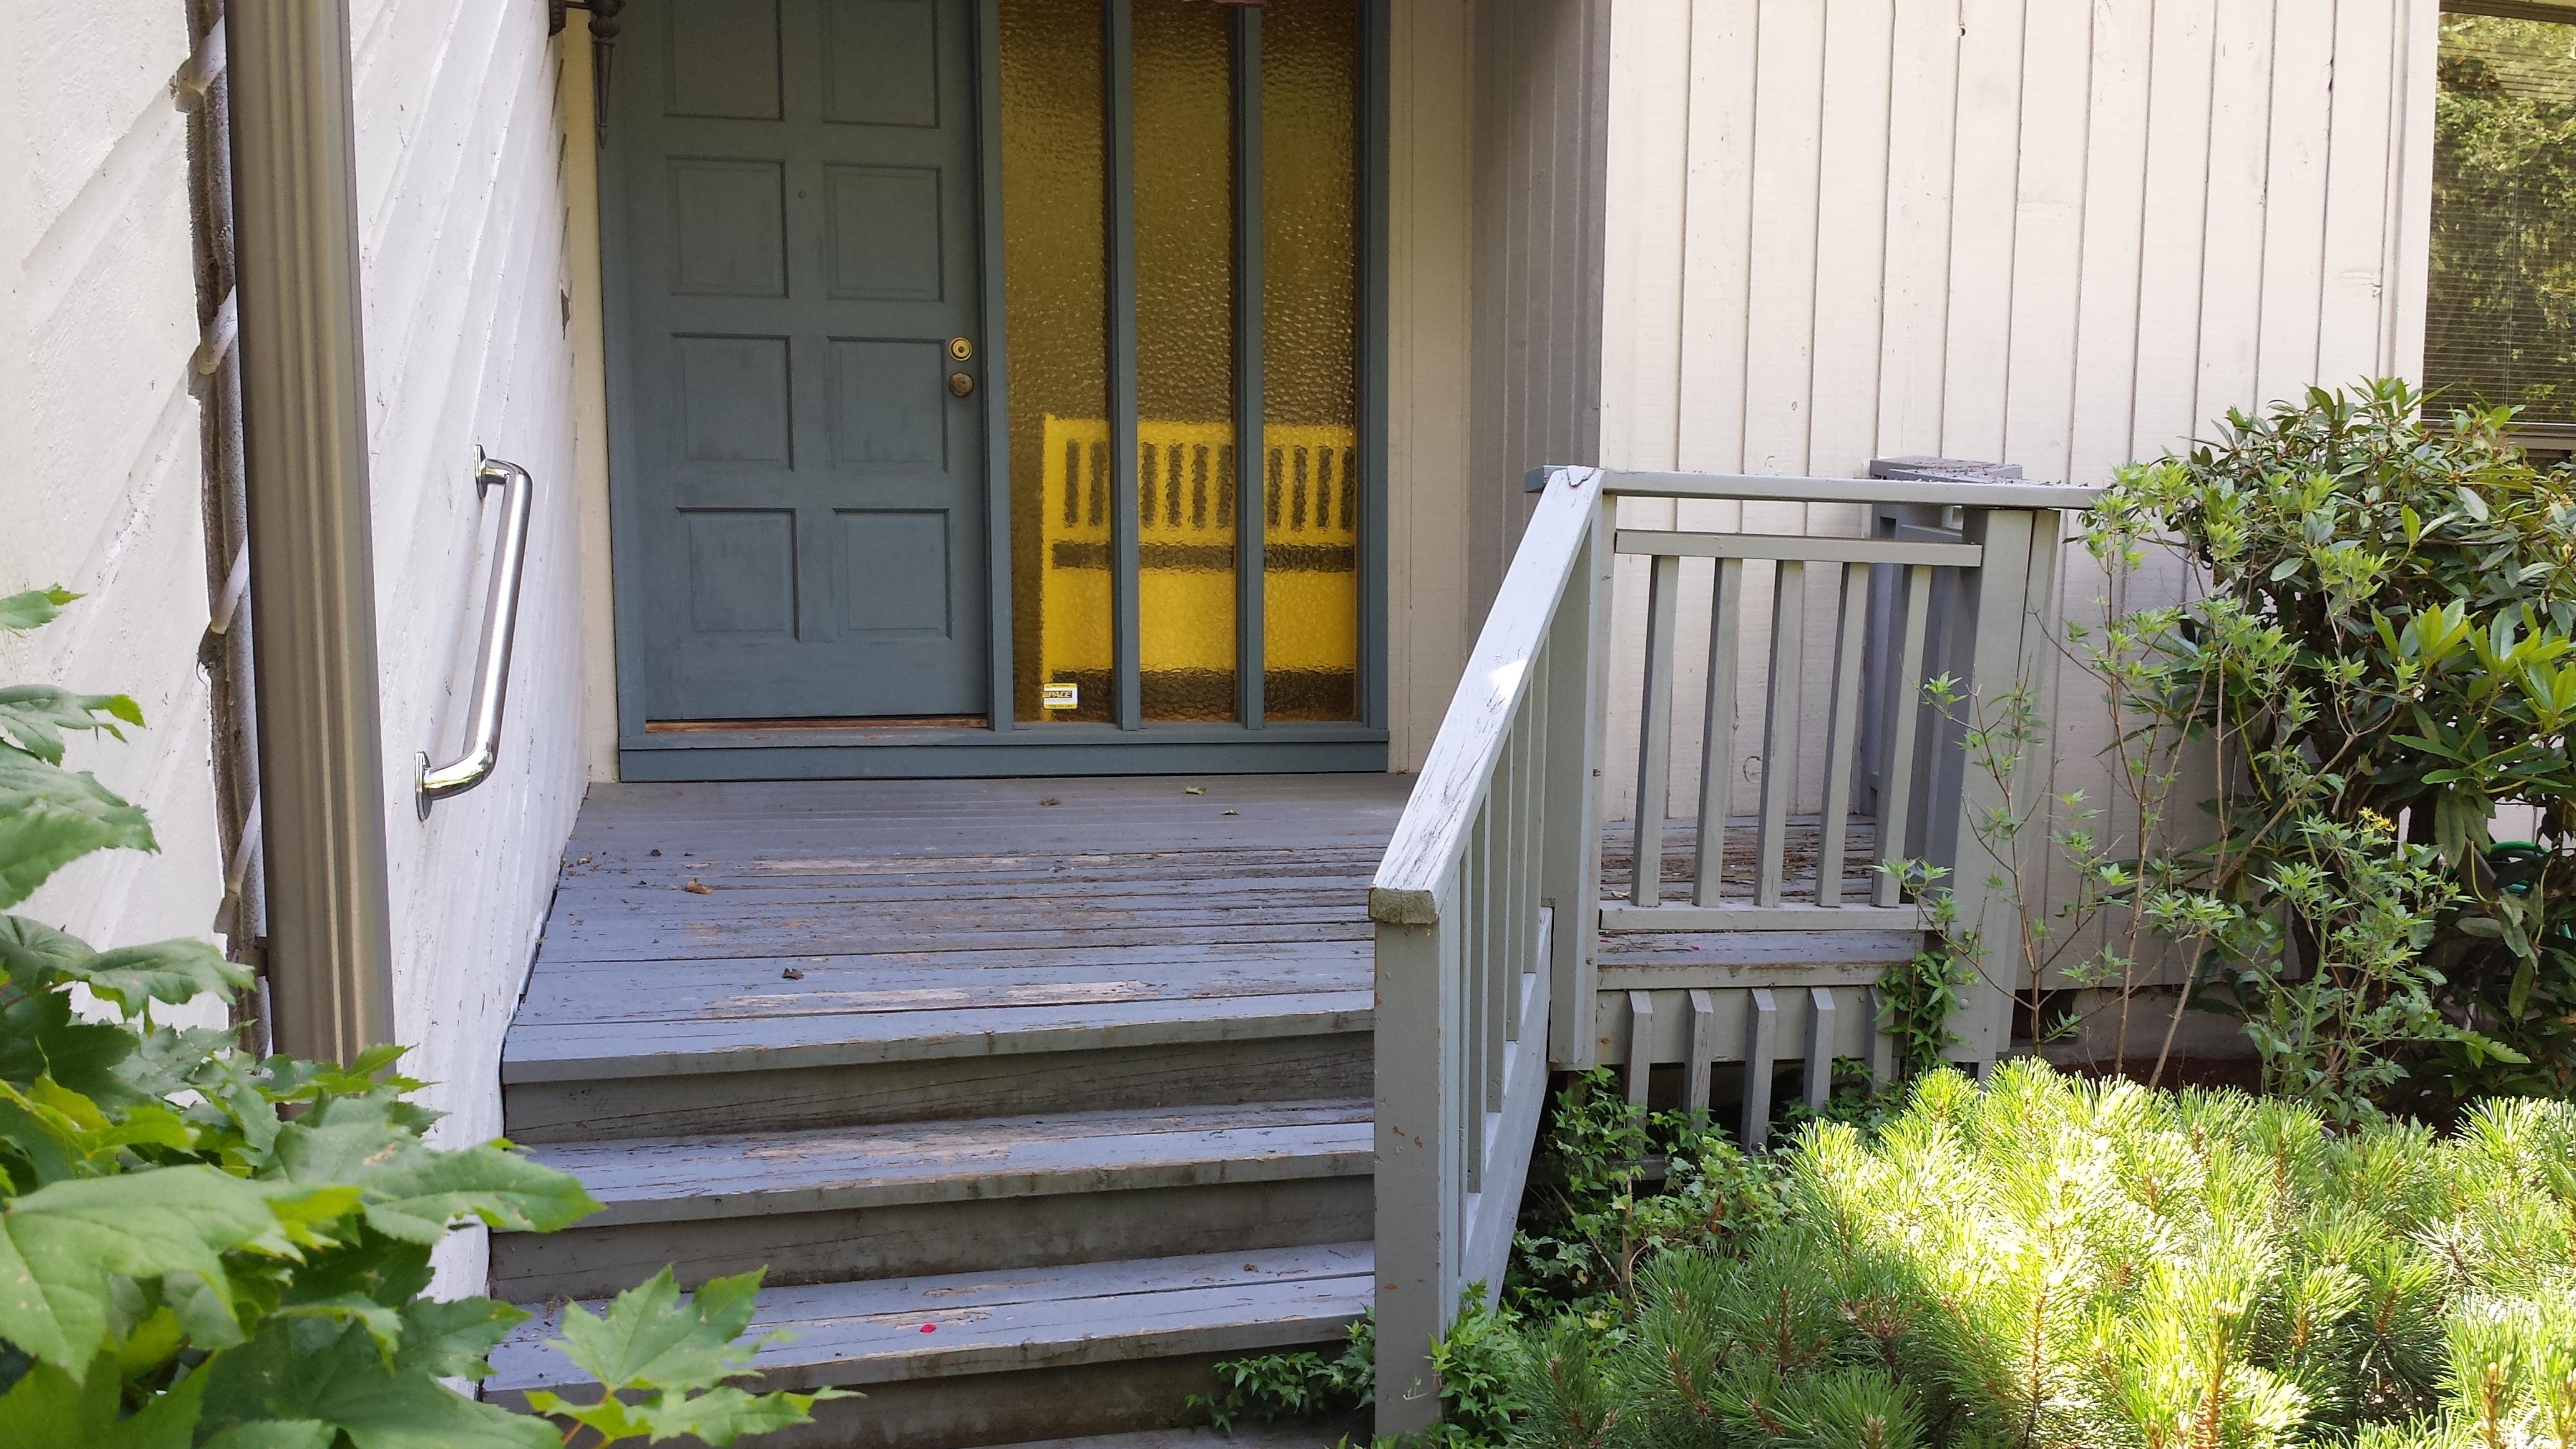 Bid on home improvement projects